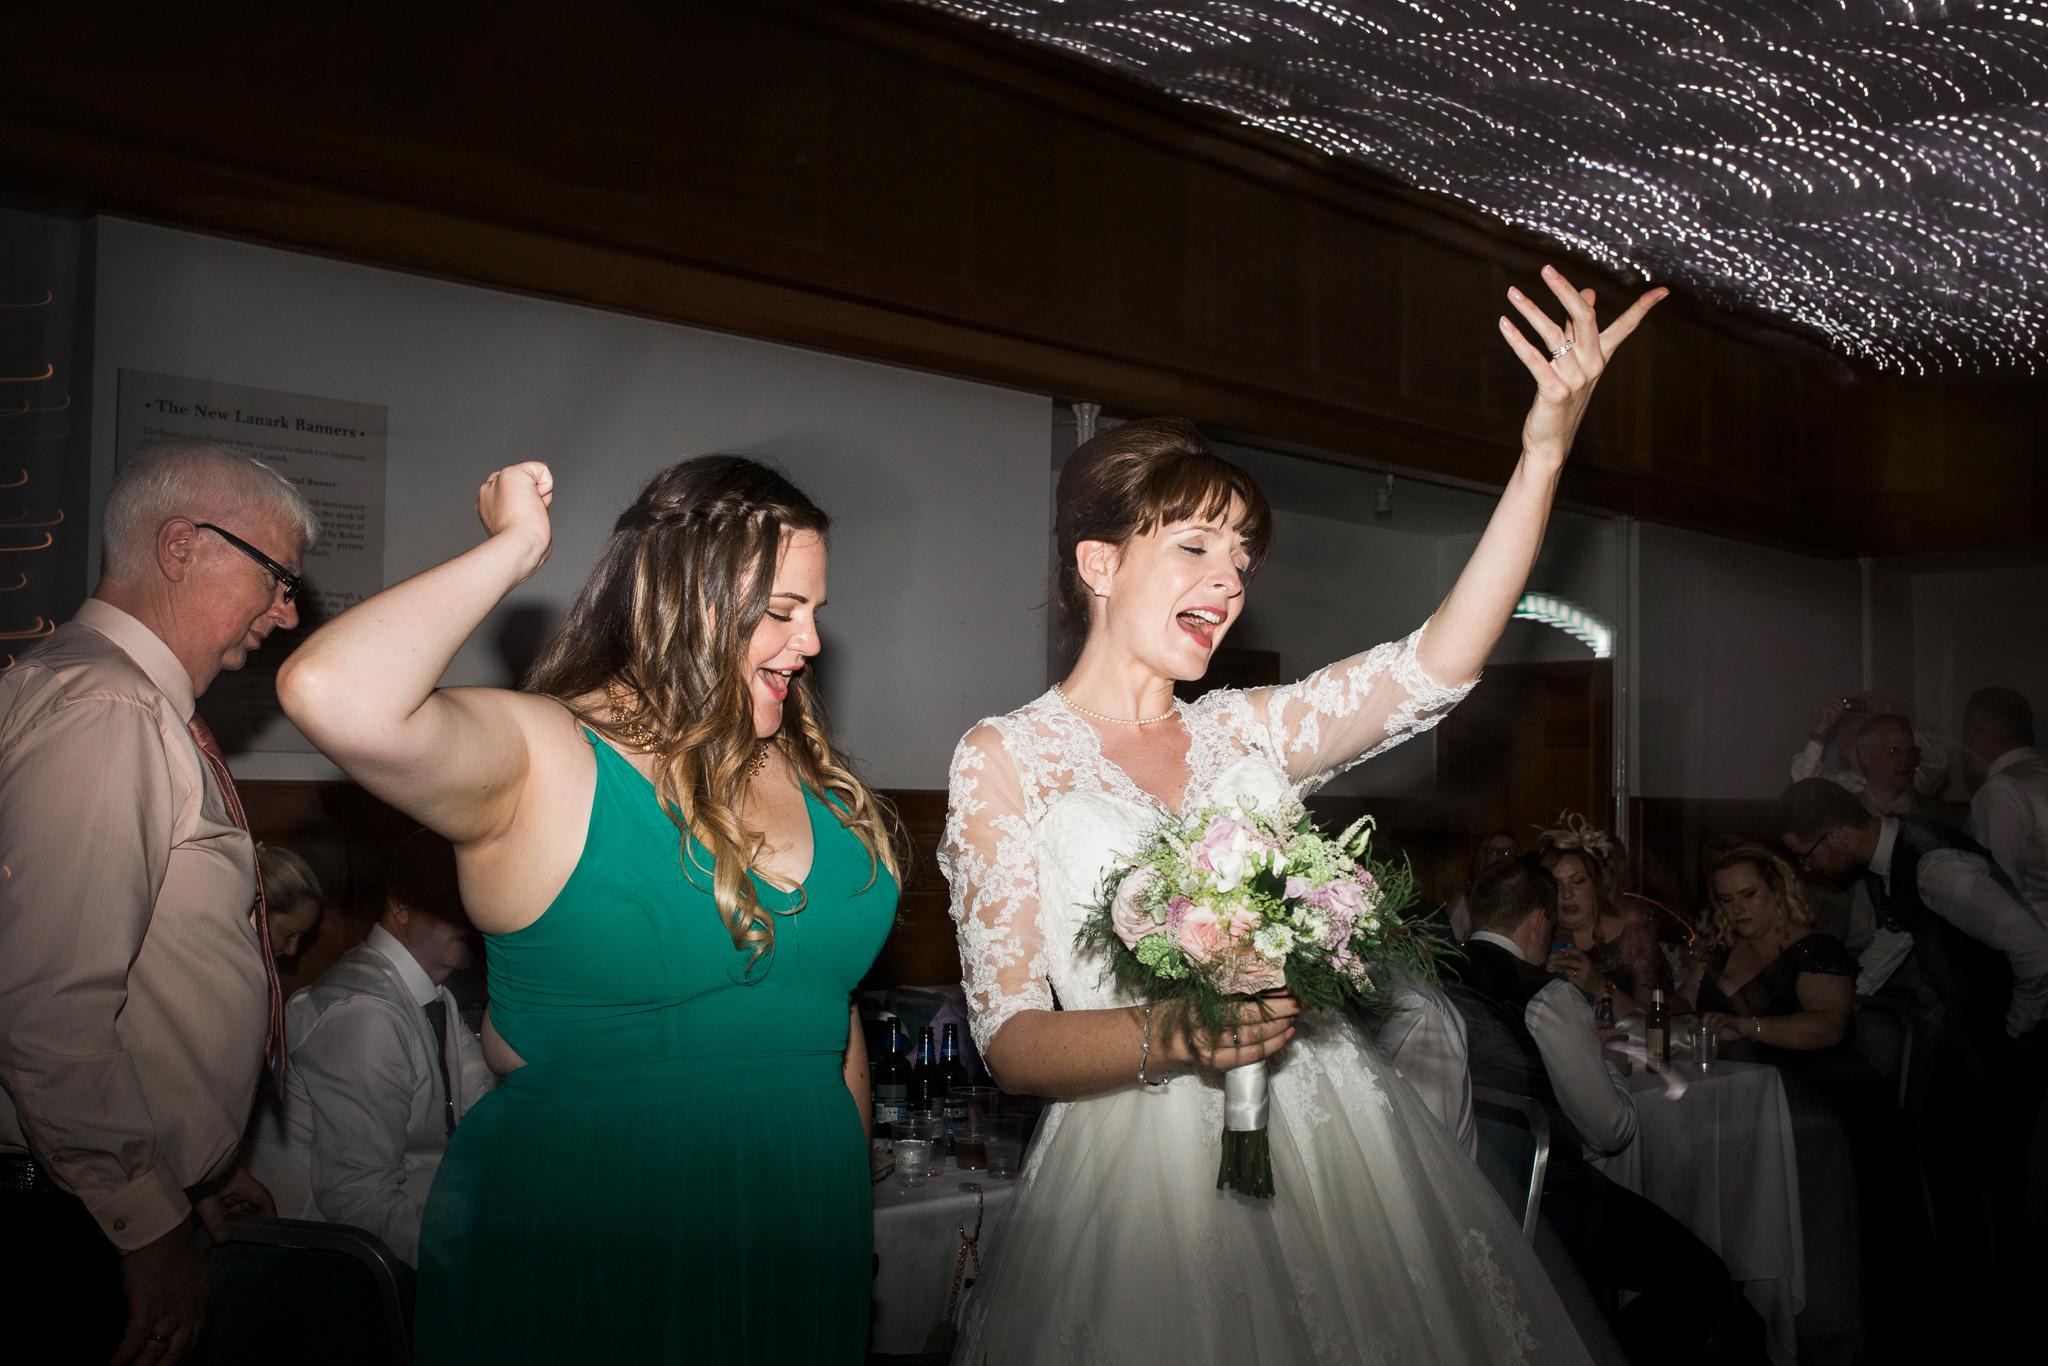 125-destination-wedding-photographer-scotland.jpg